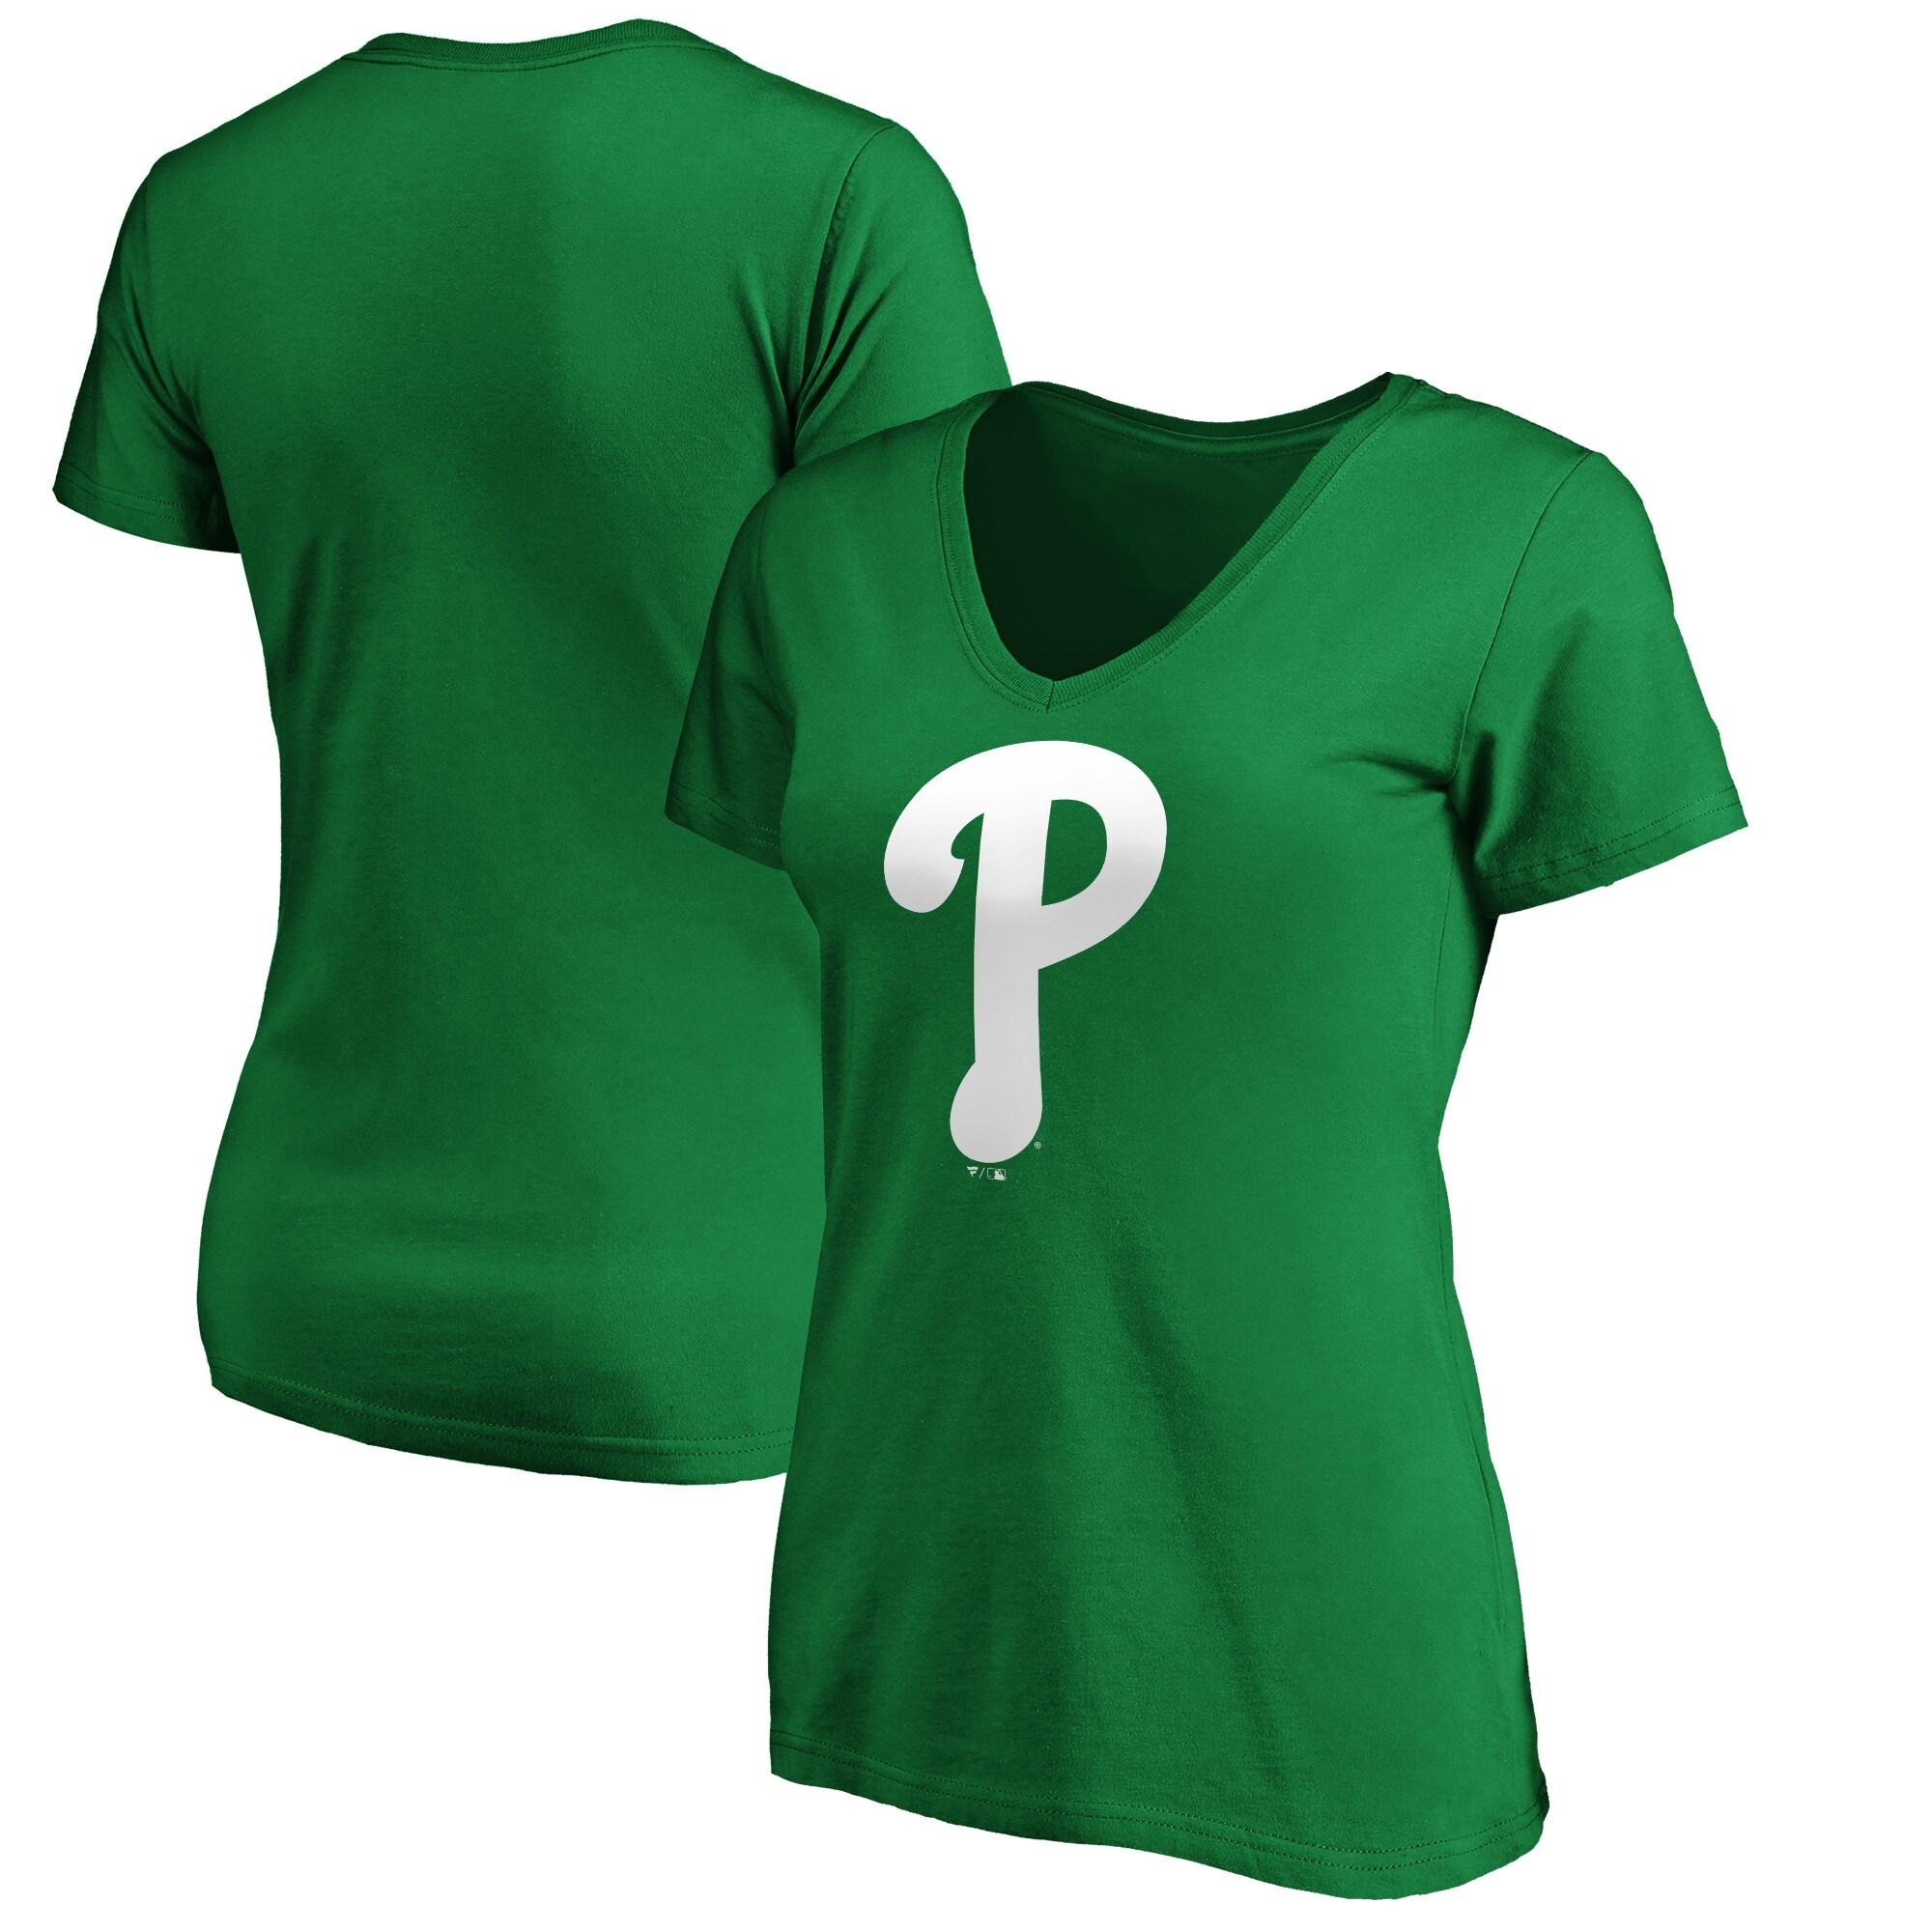 Philadelphia Phillies Fanatics Branded Women's St. Patrick's Day V-Neck T-Shirt - Kelly Green